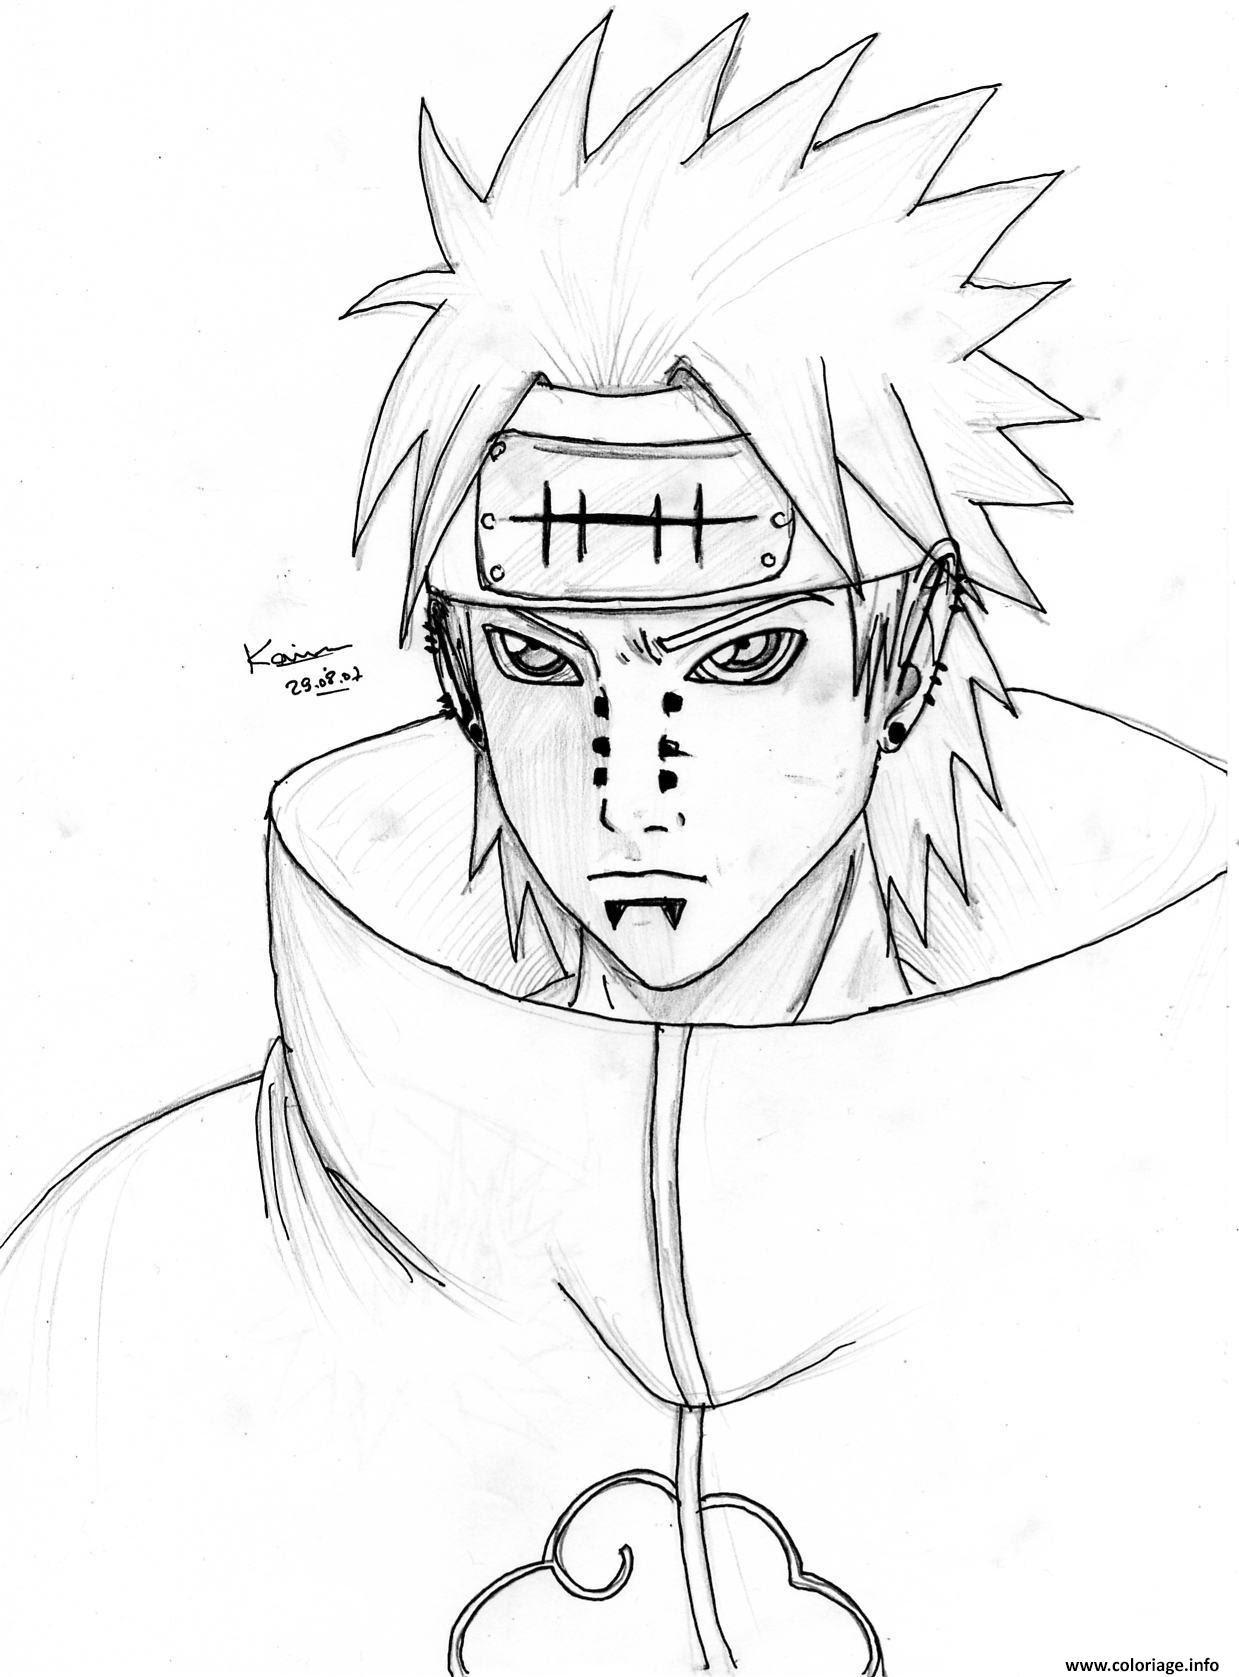 Coloriage Manga Naruto 120 Dessin  Imprimer